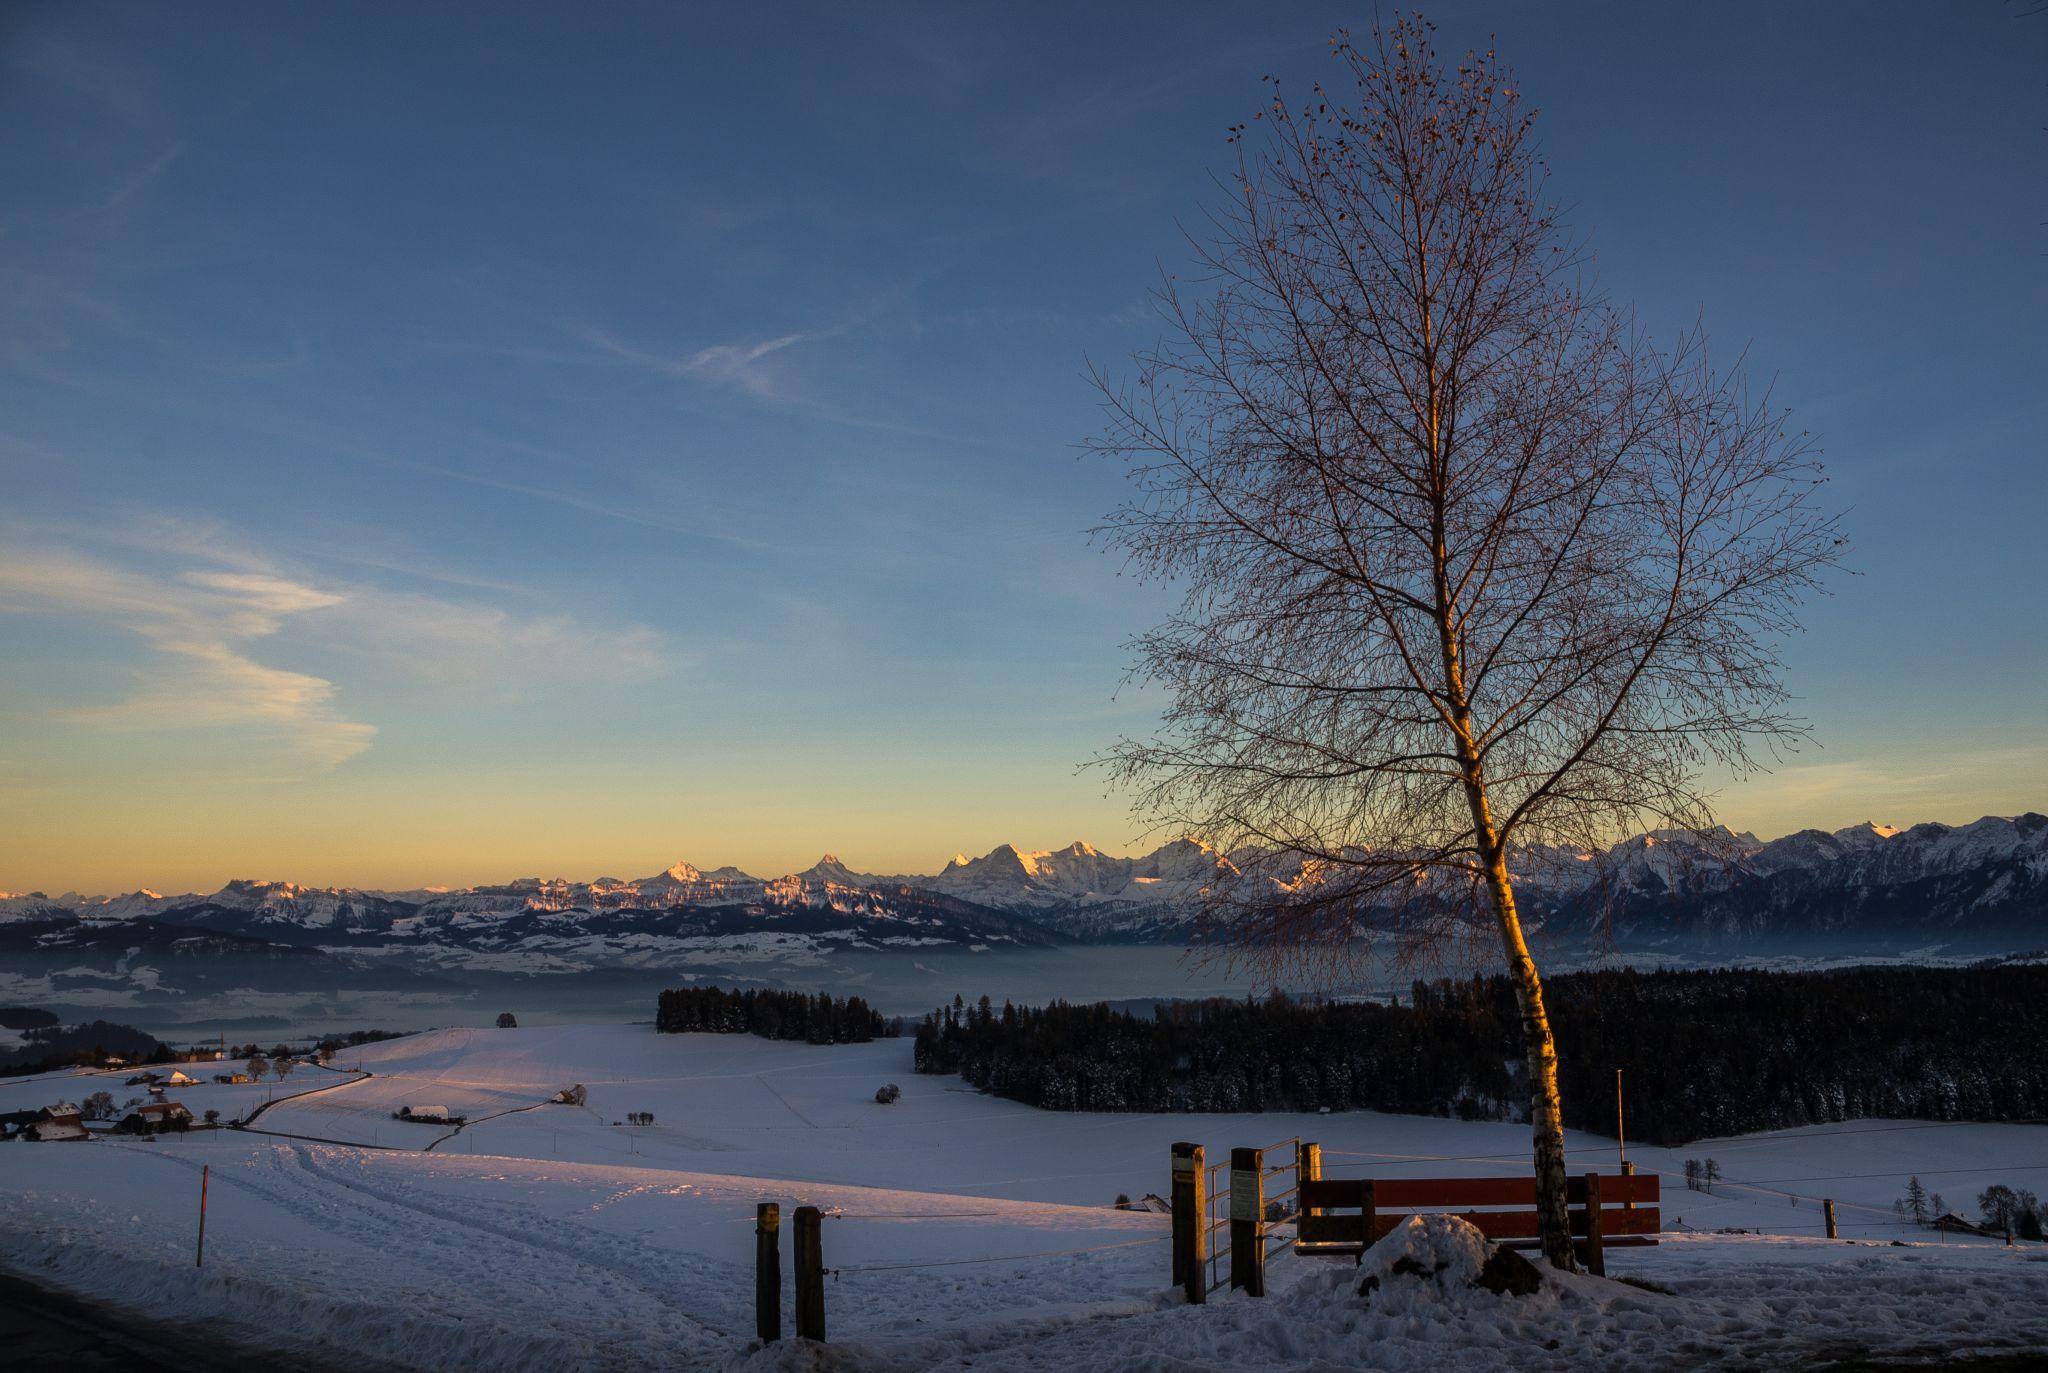 Sunset over the Bernese Alps, Switzerland